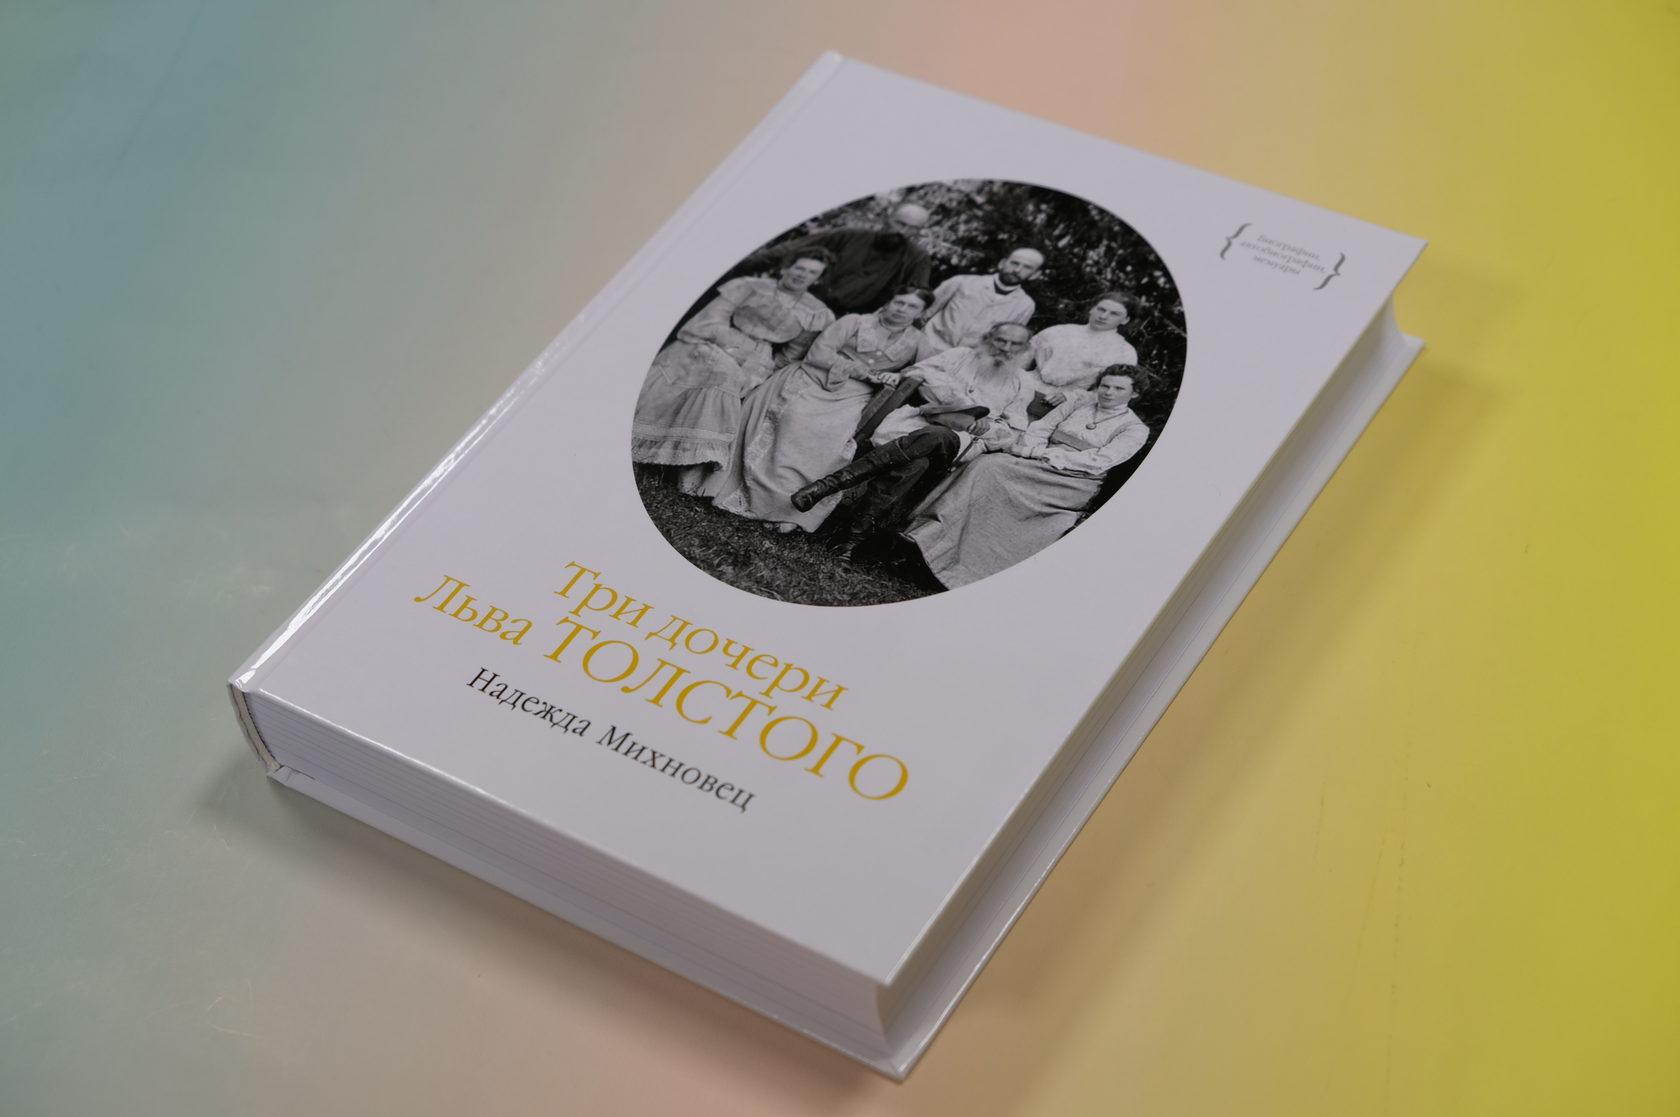 Надежда Михновец «Три дочери Льва Толстого» 978-5-389-11773-0